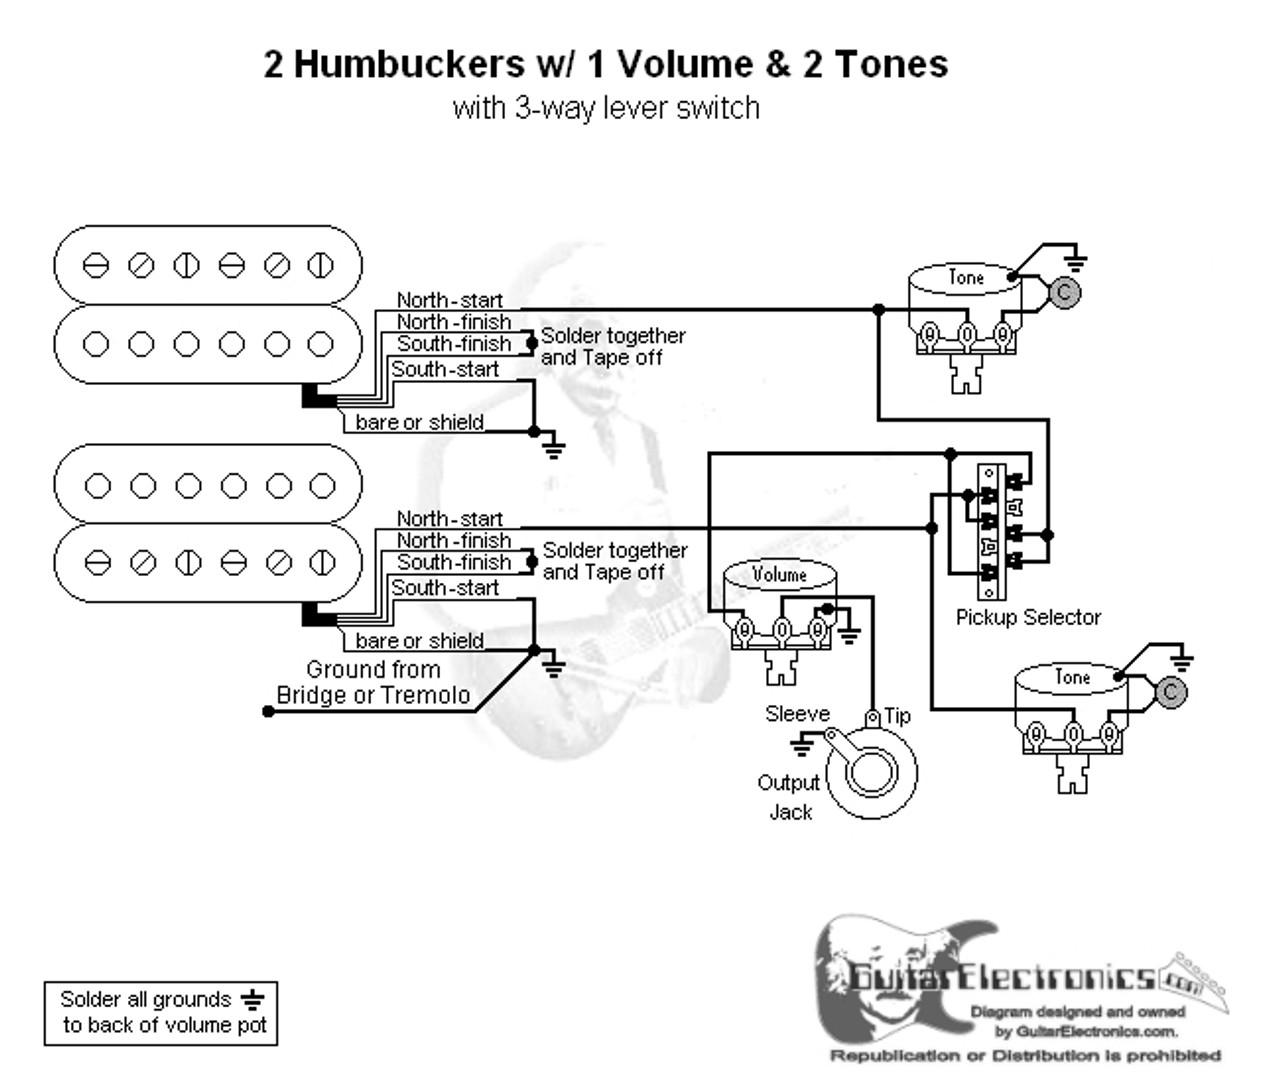 small resolution of strat wiring diagram 1 volume 2 tones auto wiring diagram2 humbuckers 3 way lever switch 1 volume 2 tones hss strat wiring diagram 1 volume 2 tone strat